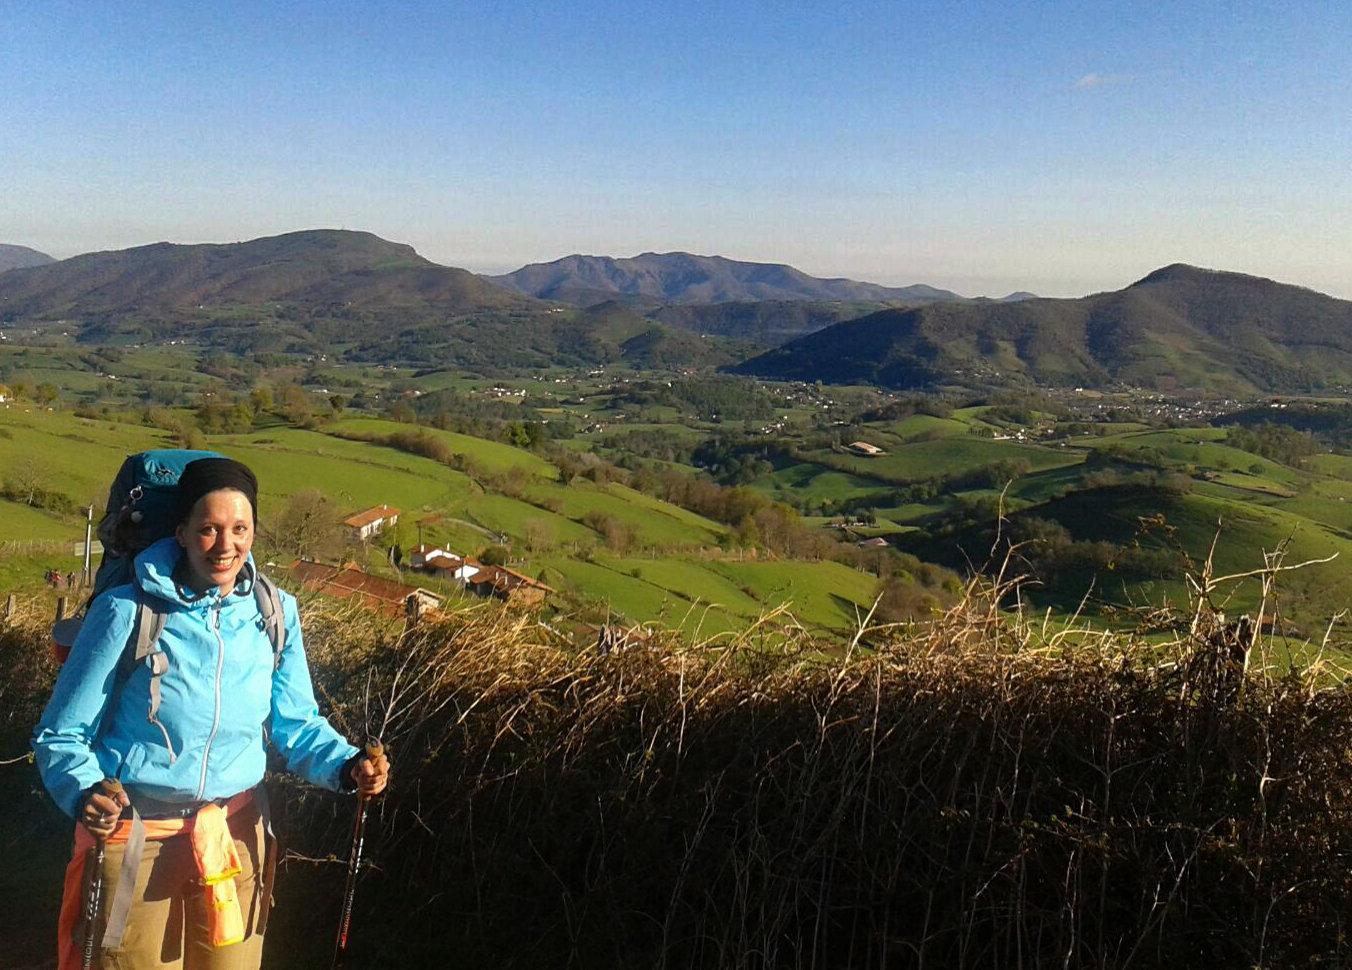 Audrey im Wanderland, Ibaneta Pass, Camino Francés, Wandern, Wandertour, Pilgern, Jakobsweg, Pyrenäeen, Frankreich, Spanien